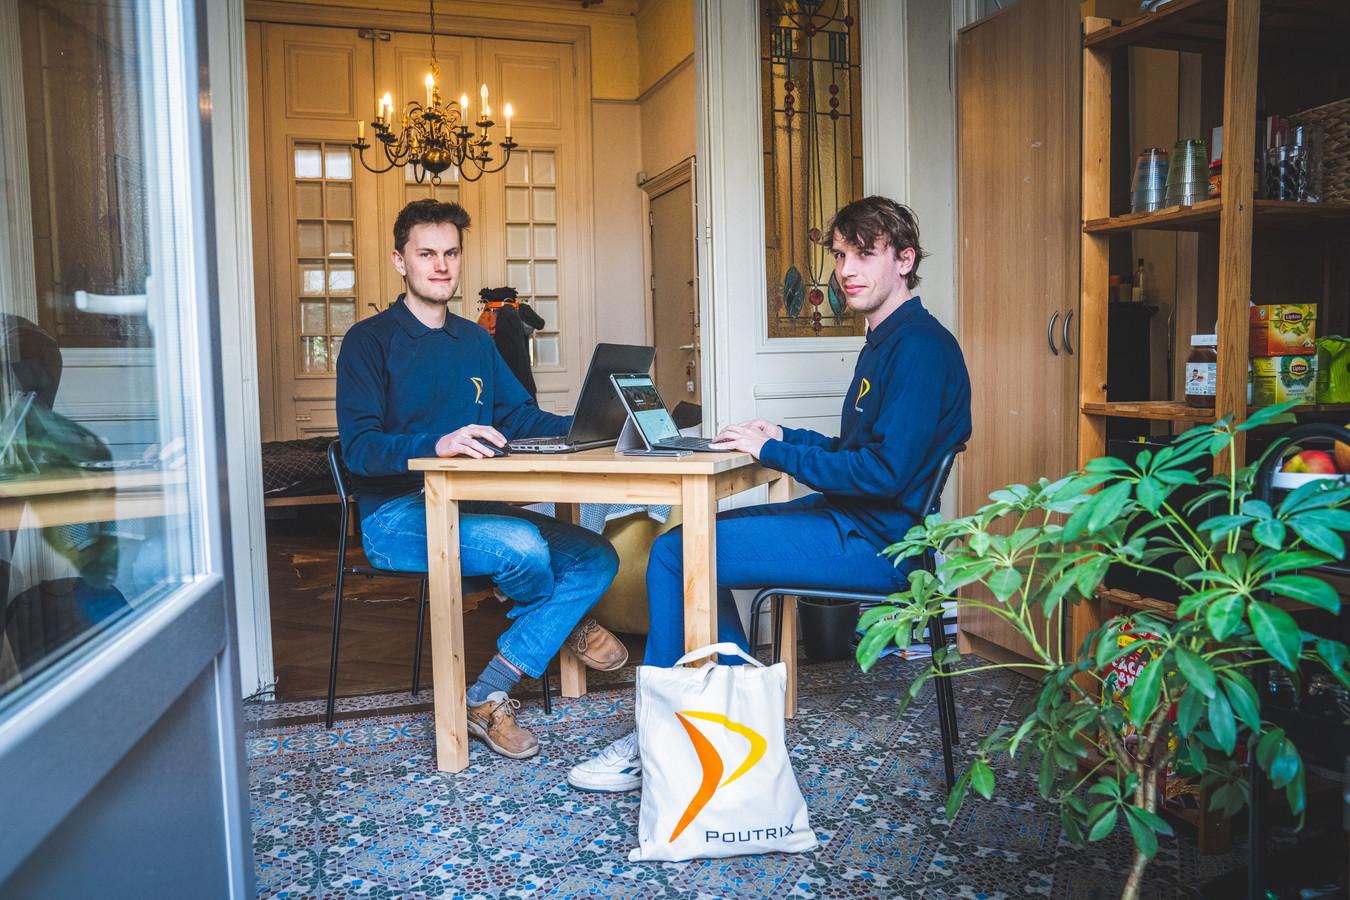 Poutrix-bestuursleden en organisatoren Thomas Meyers (l.) en Rian Denys (r.).